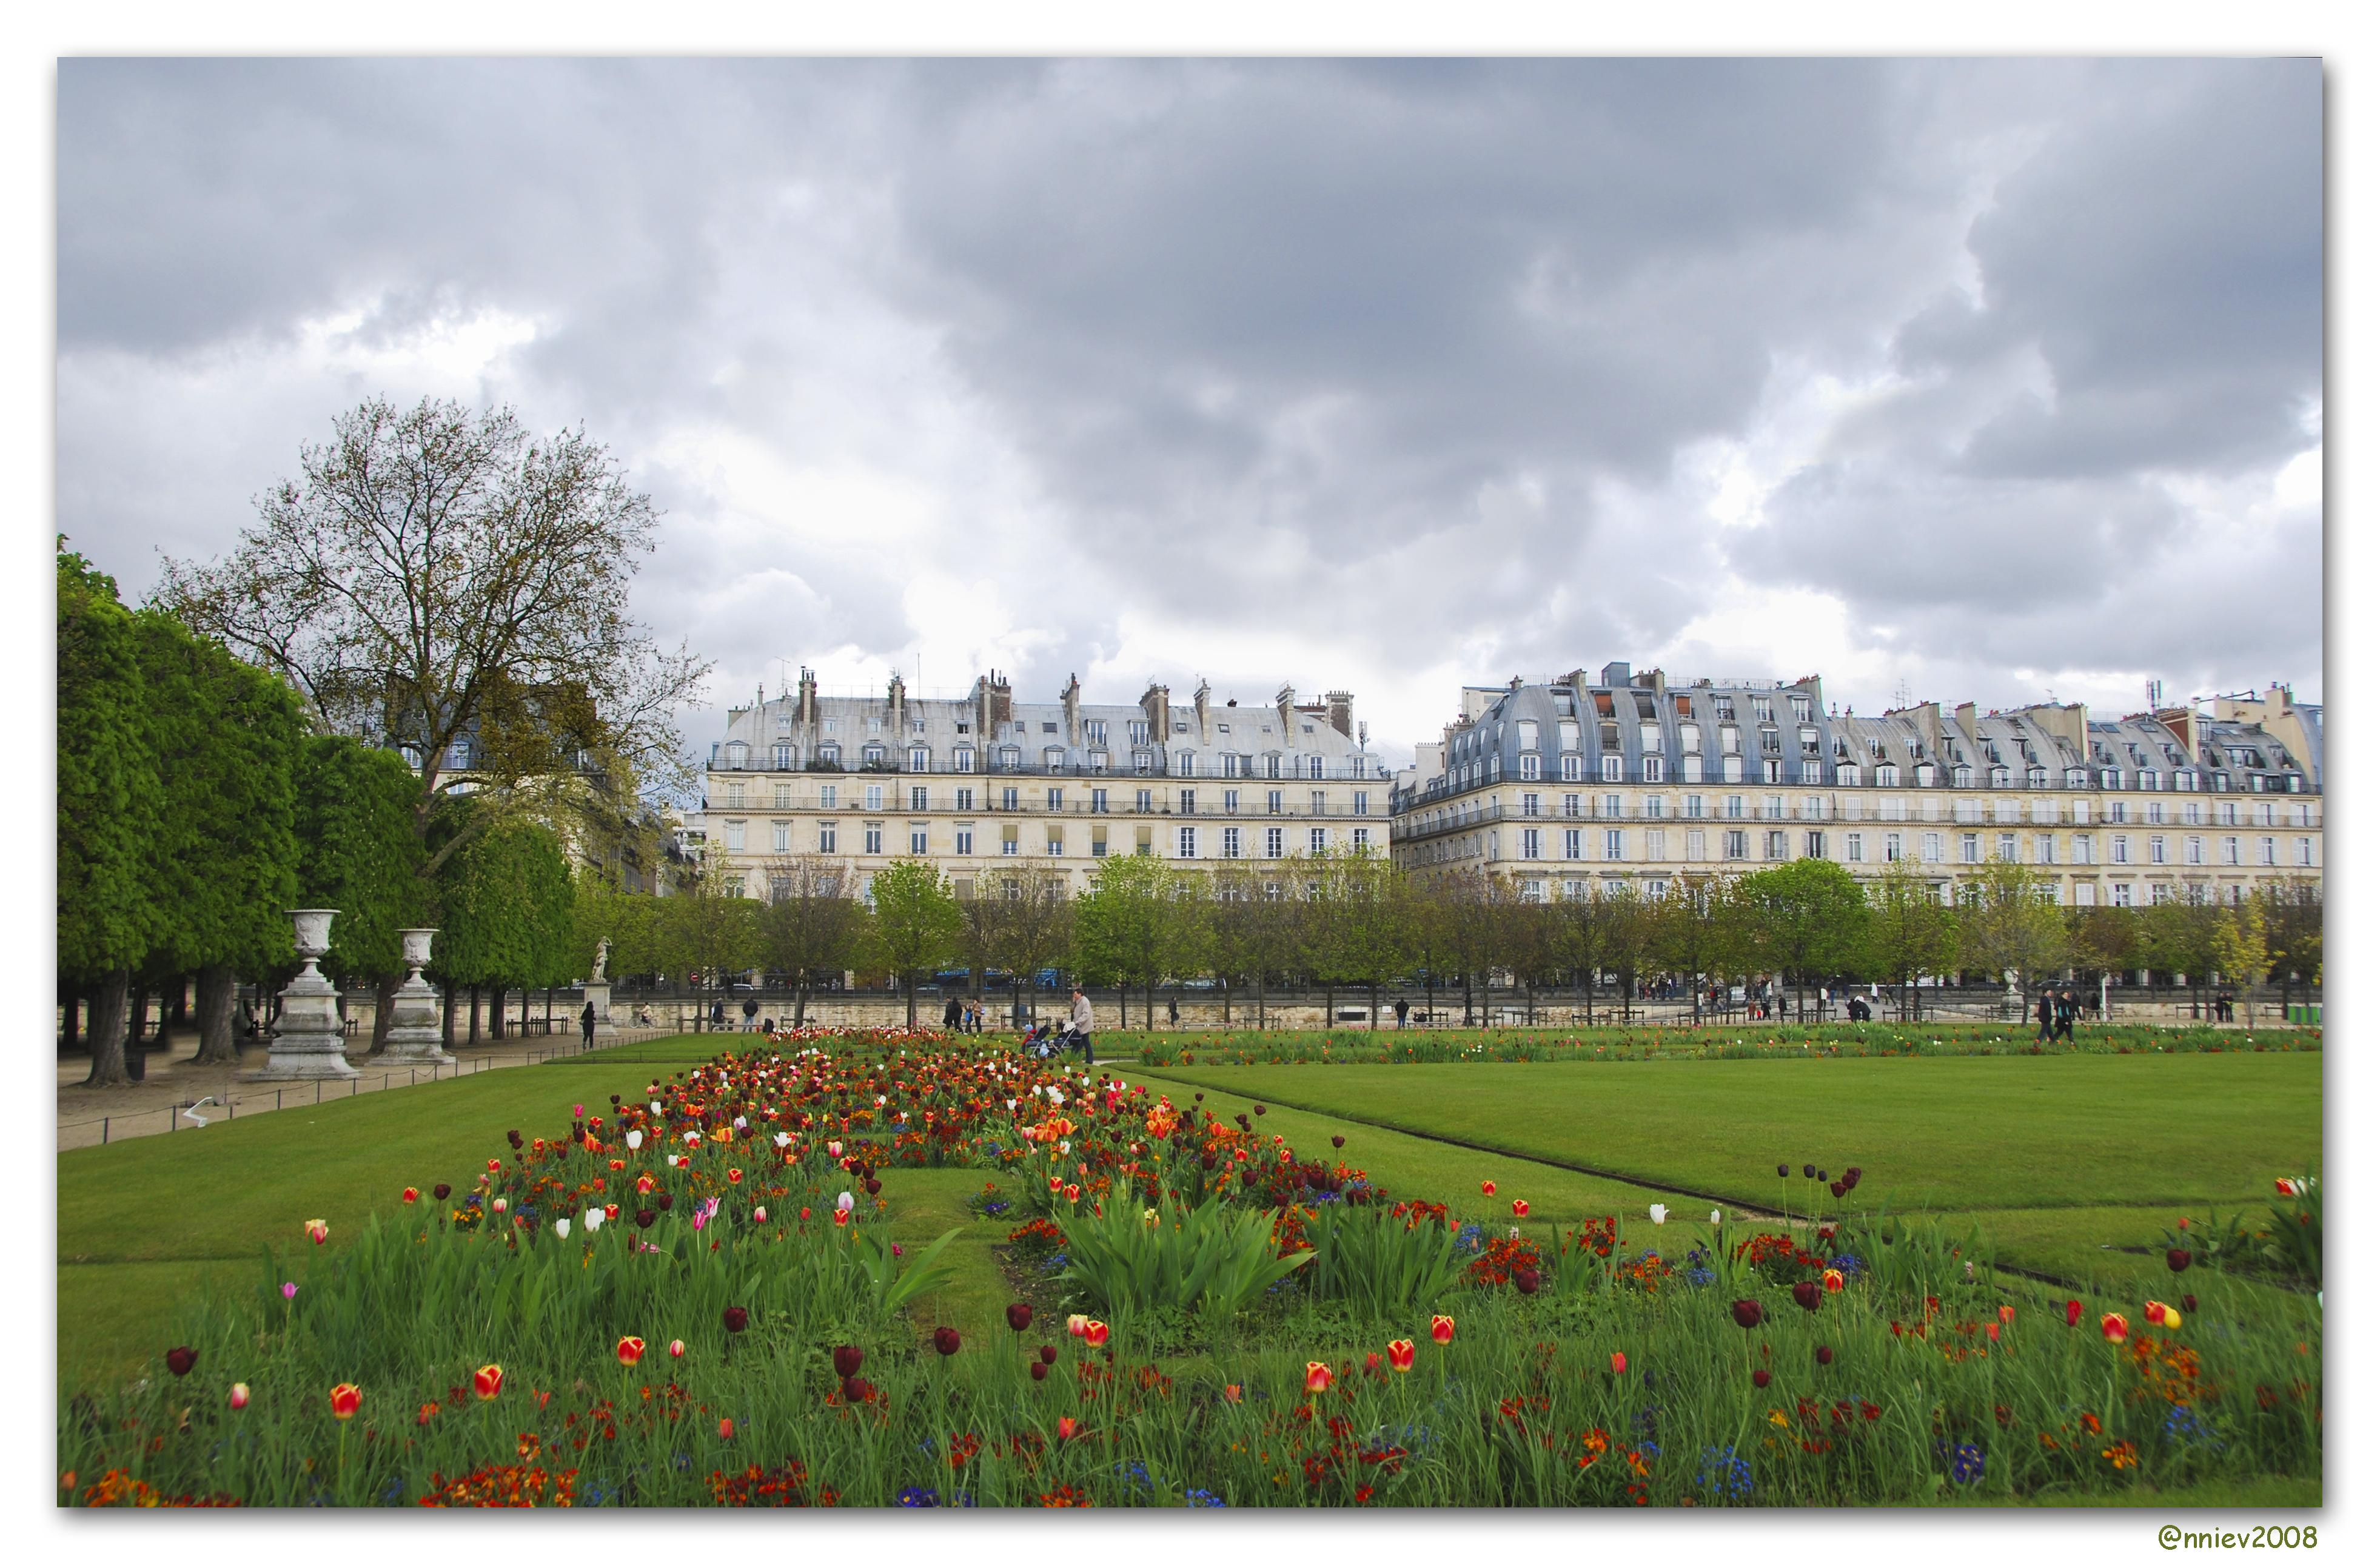 File:Jardin des Tuileries.jpg - Wikimedia Commons